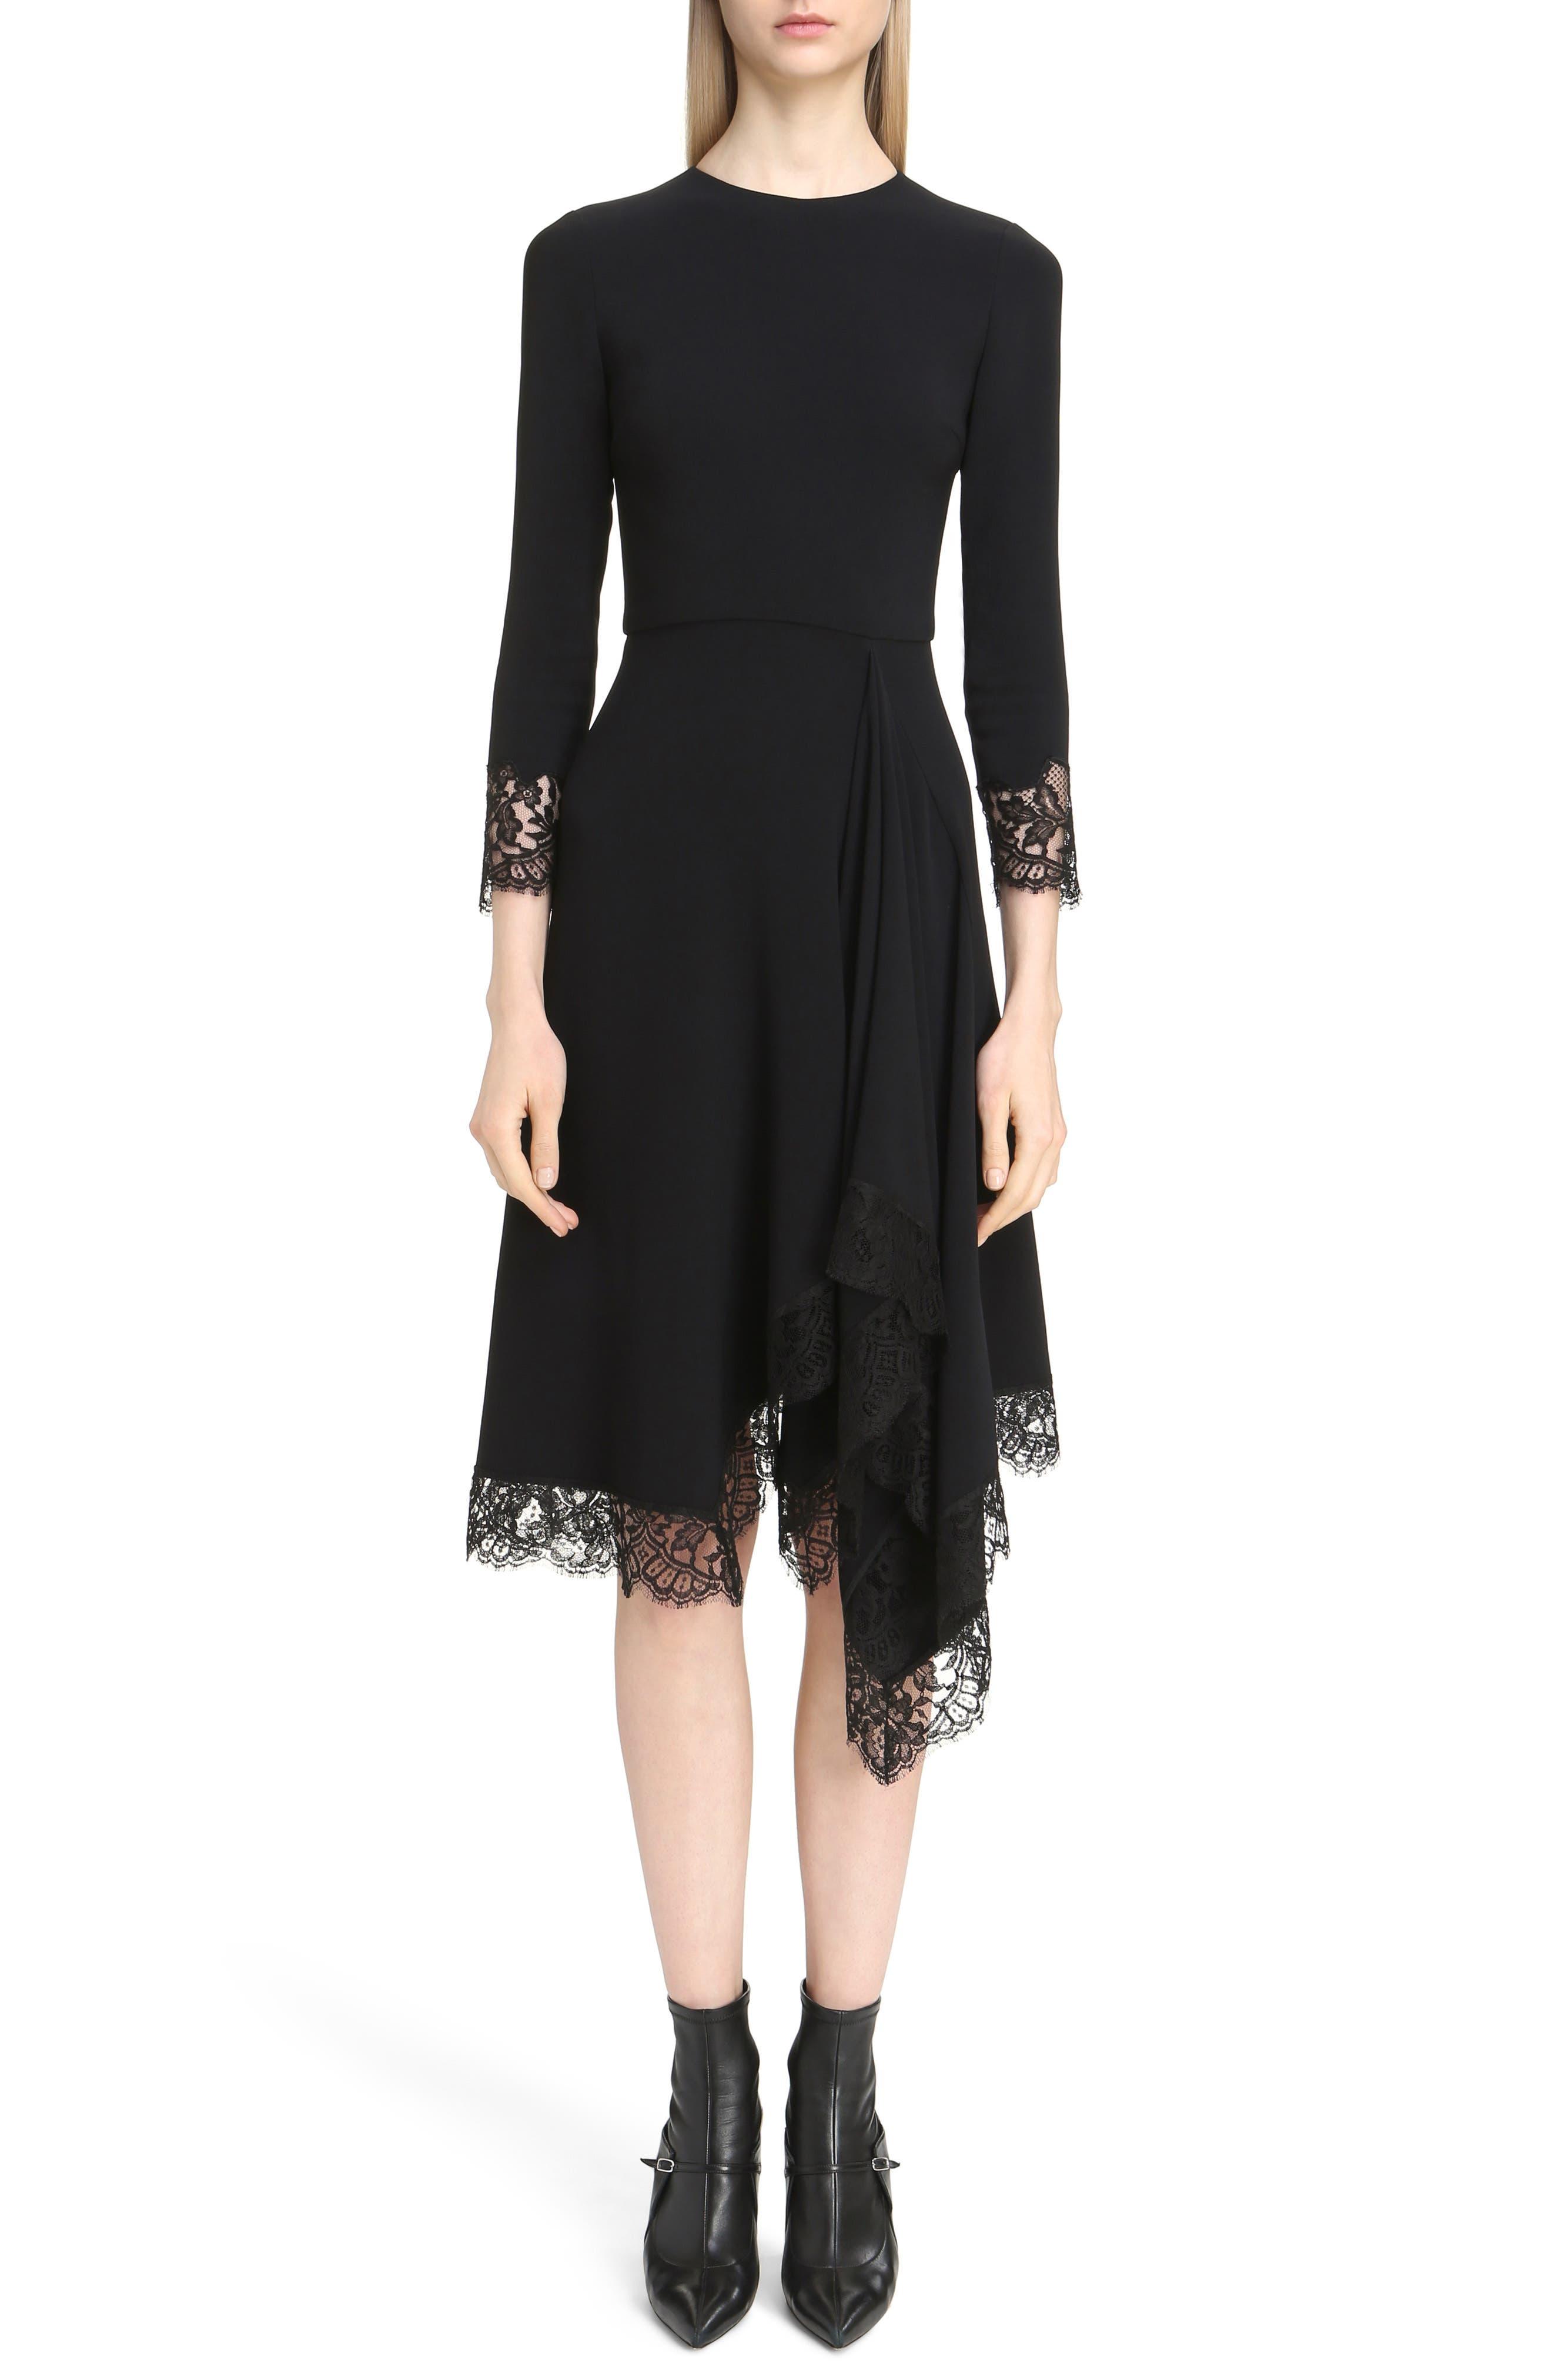 Alternate Image 1 Selected - Givenchy Lace Trim Stretch Cady Asymmetrical Dress